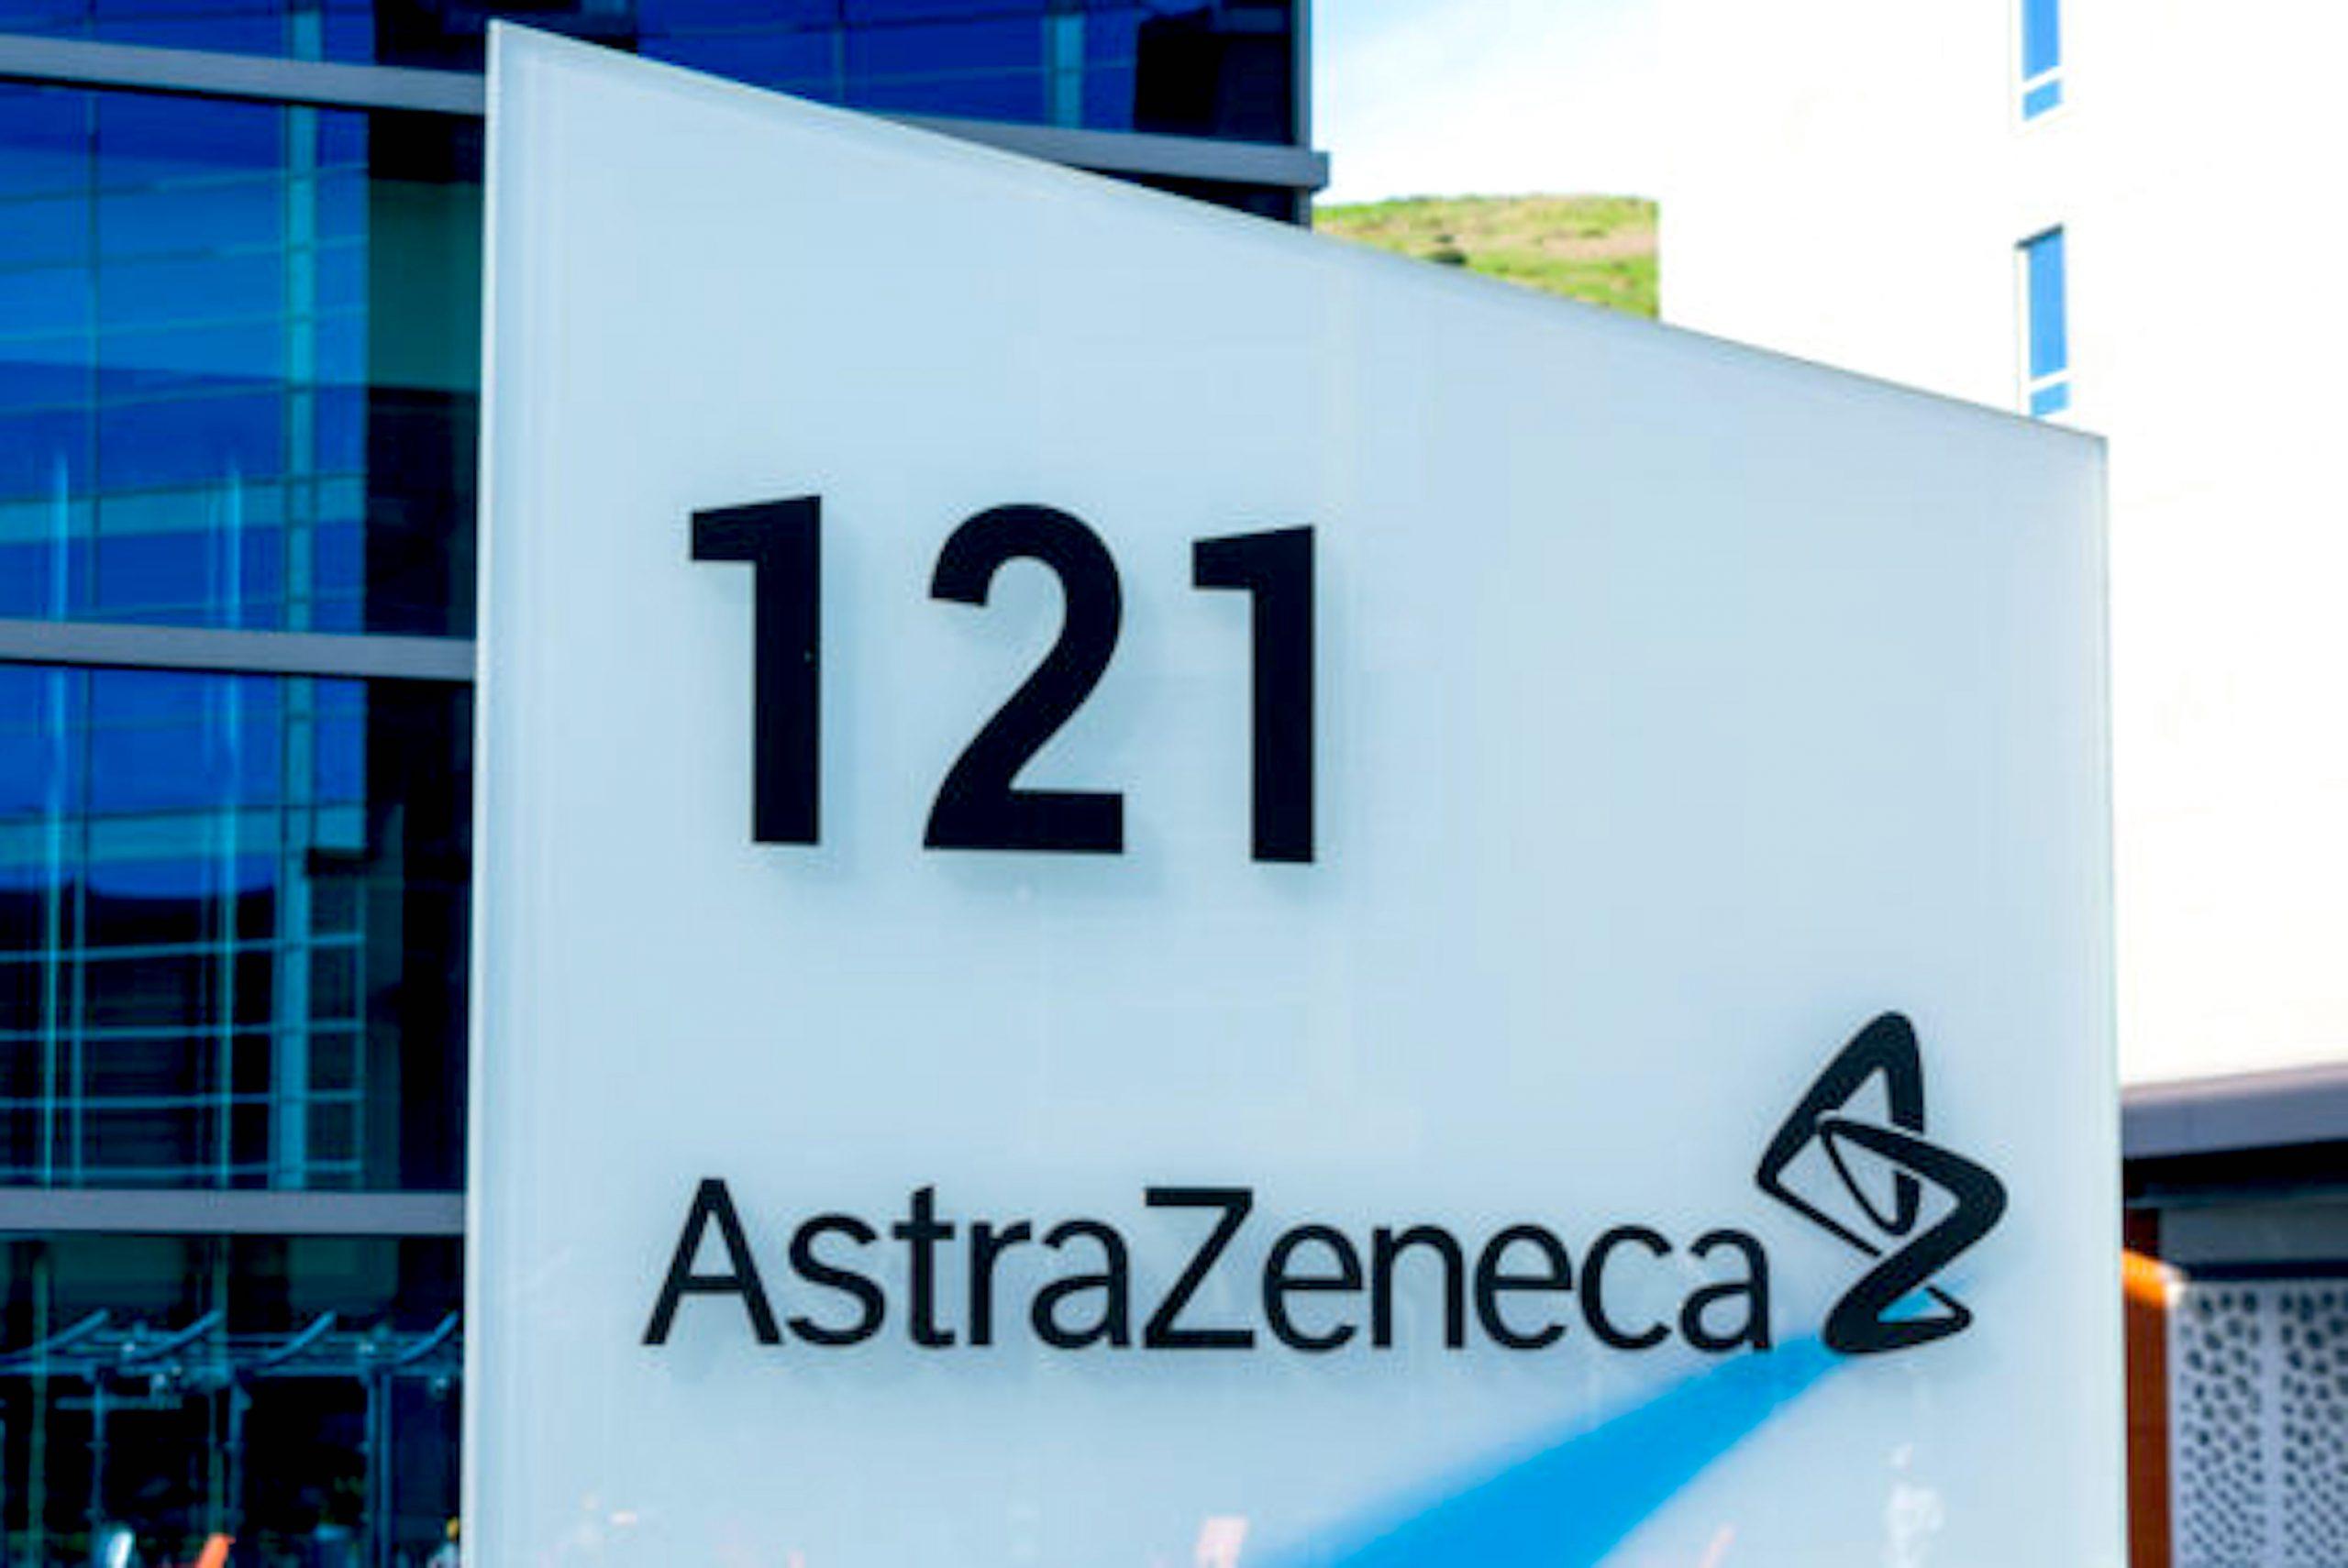 AstraZeneca sign at British Swedish multinational pharmaceutical and biopharmaceutical company campus, San Francisco (foto Depositphotos.com)